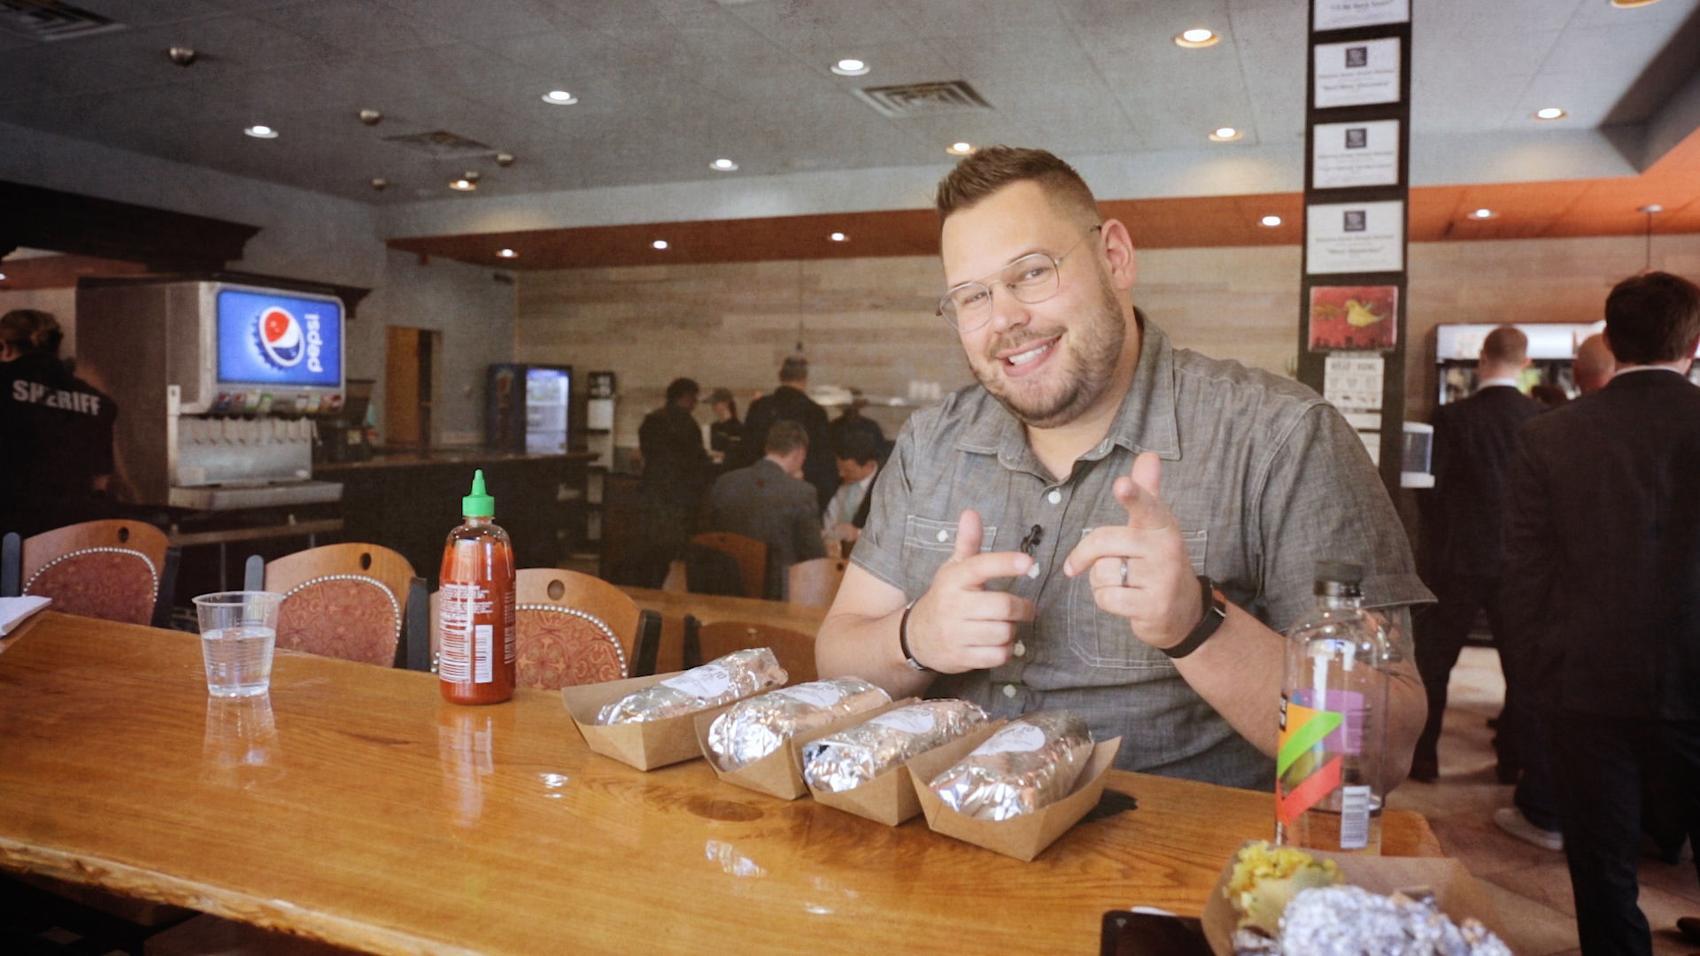 LNP - Lancaster Online, The Food Dude